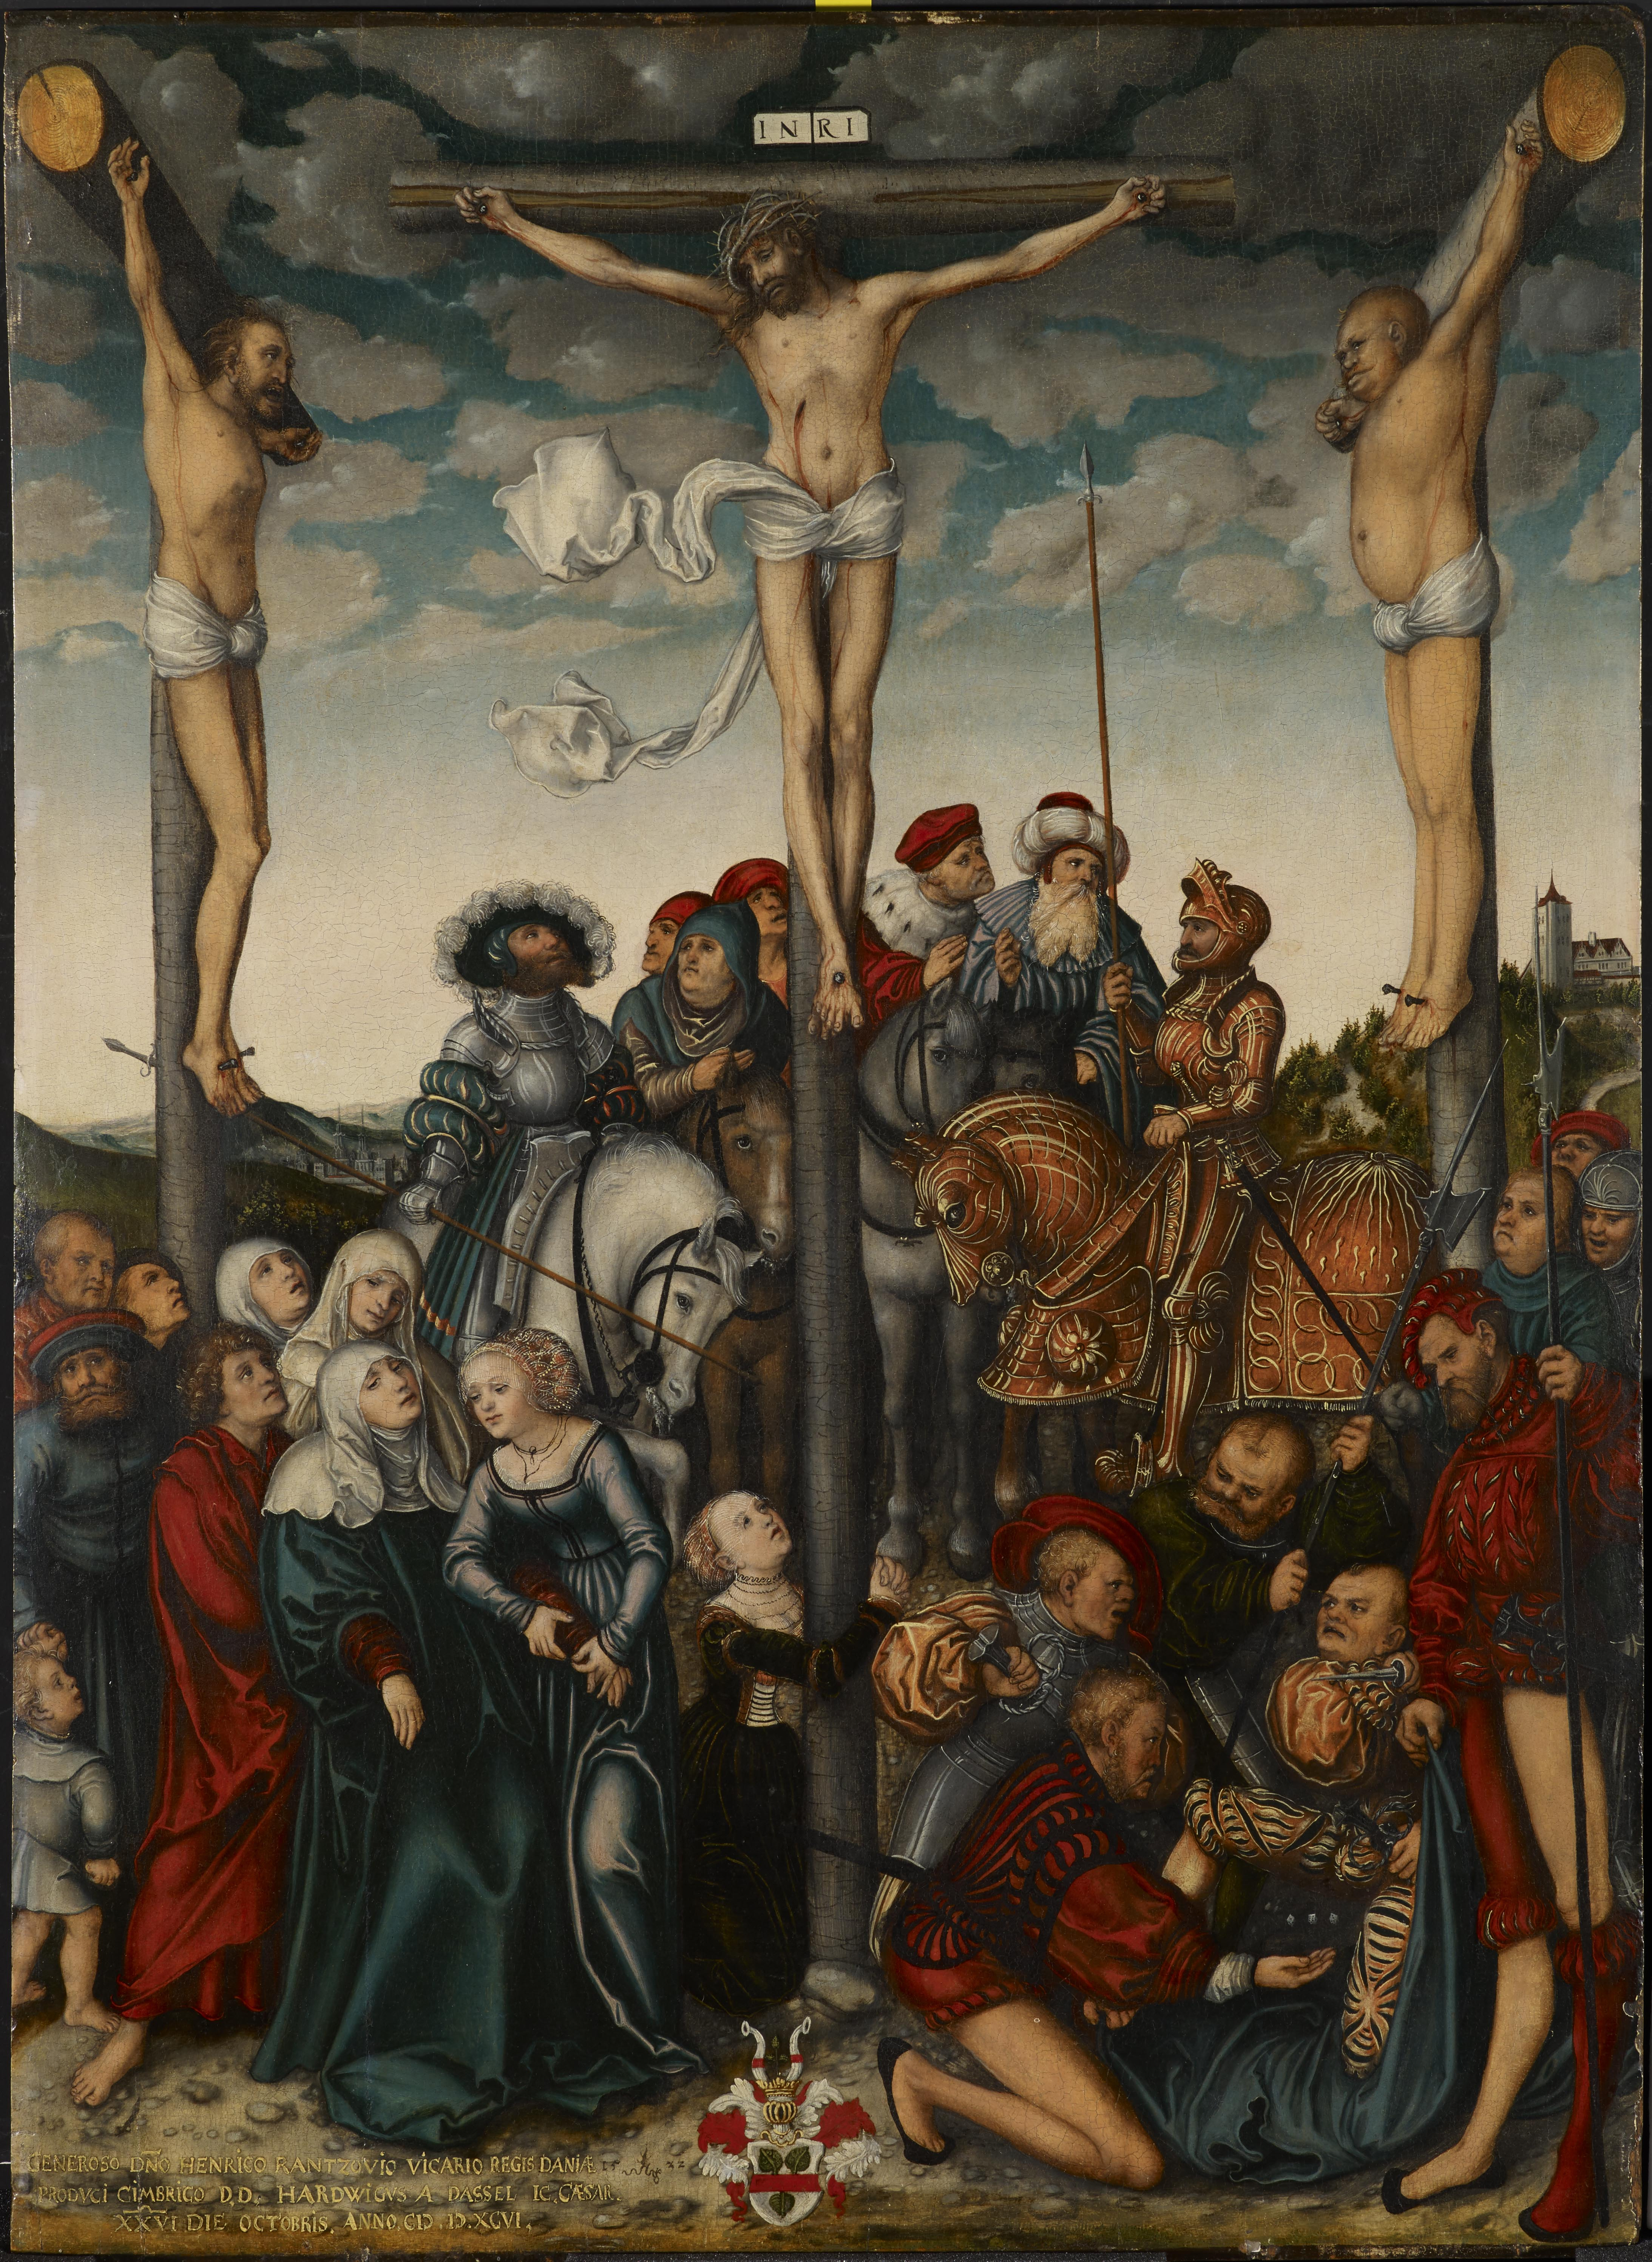 Ä. - Kreuzigung (1532, Indianapolis Museum of